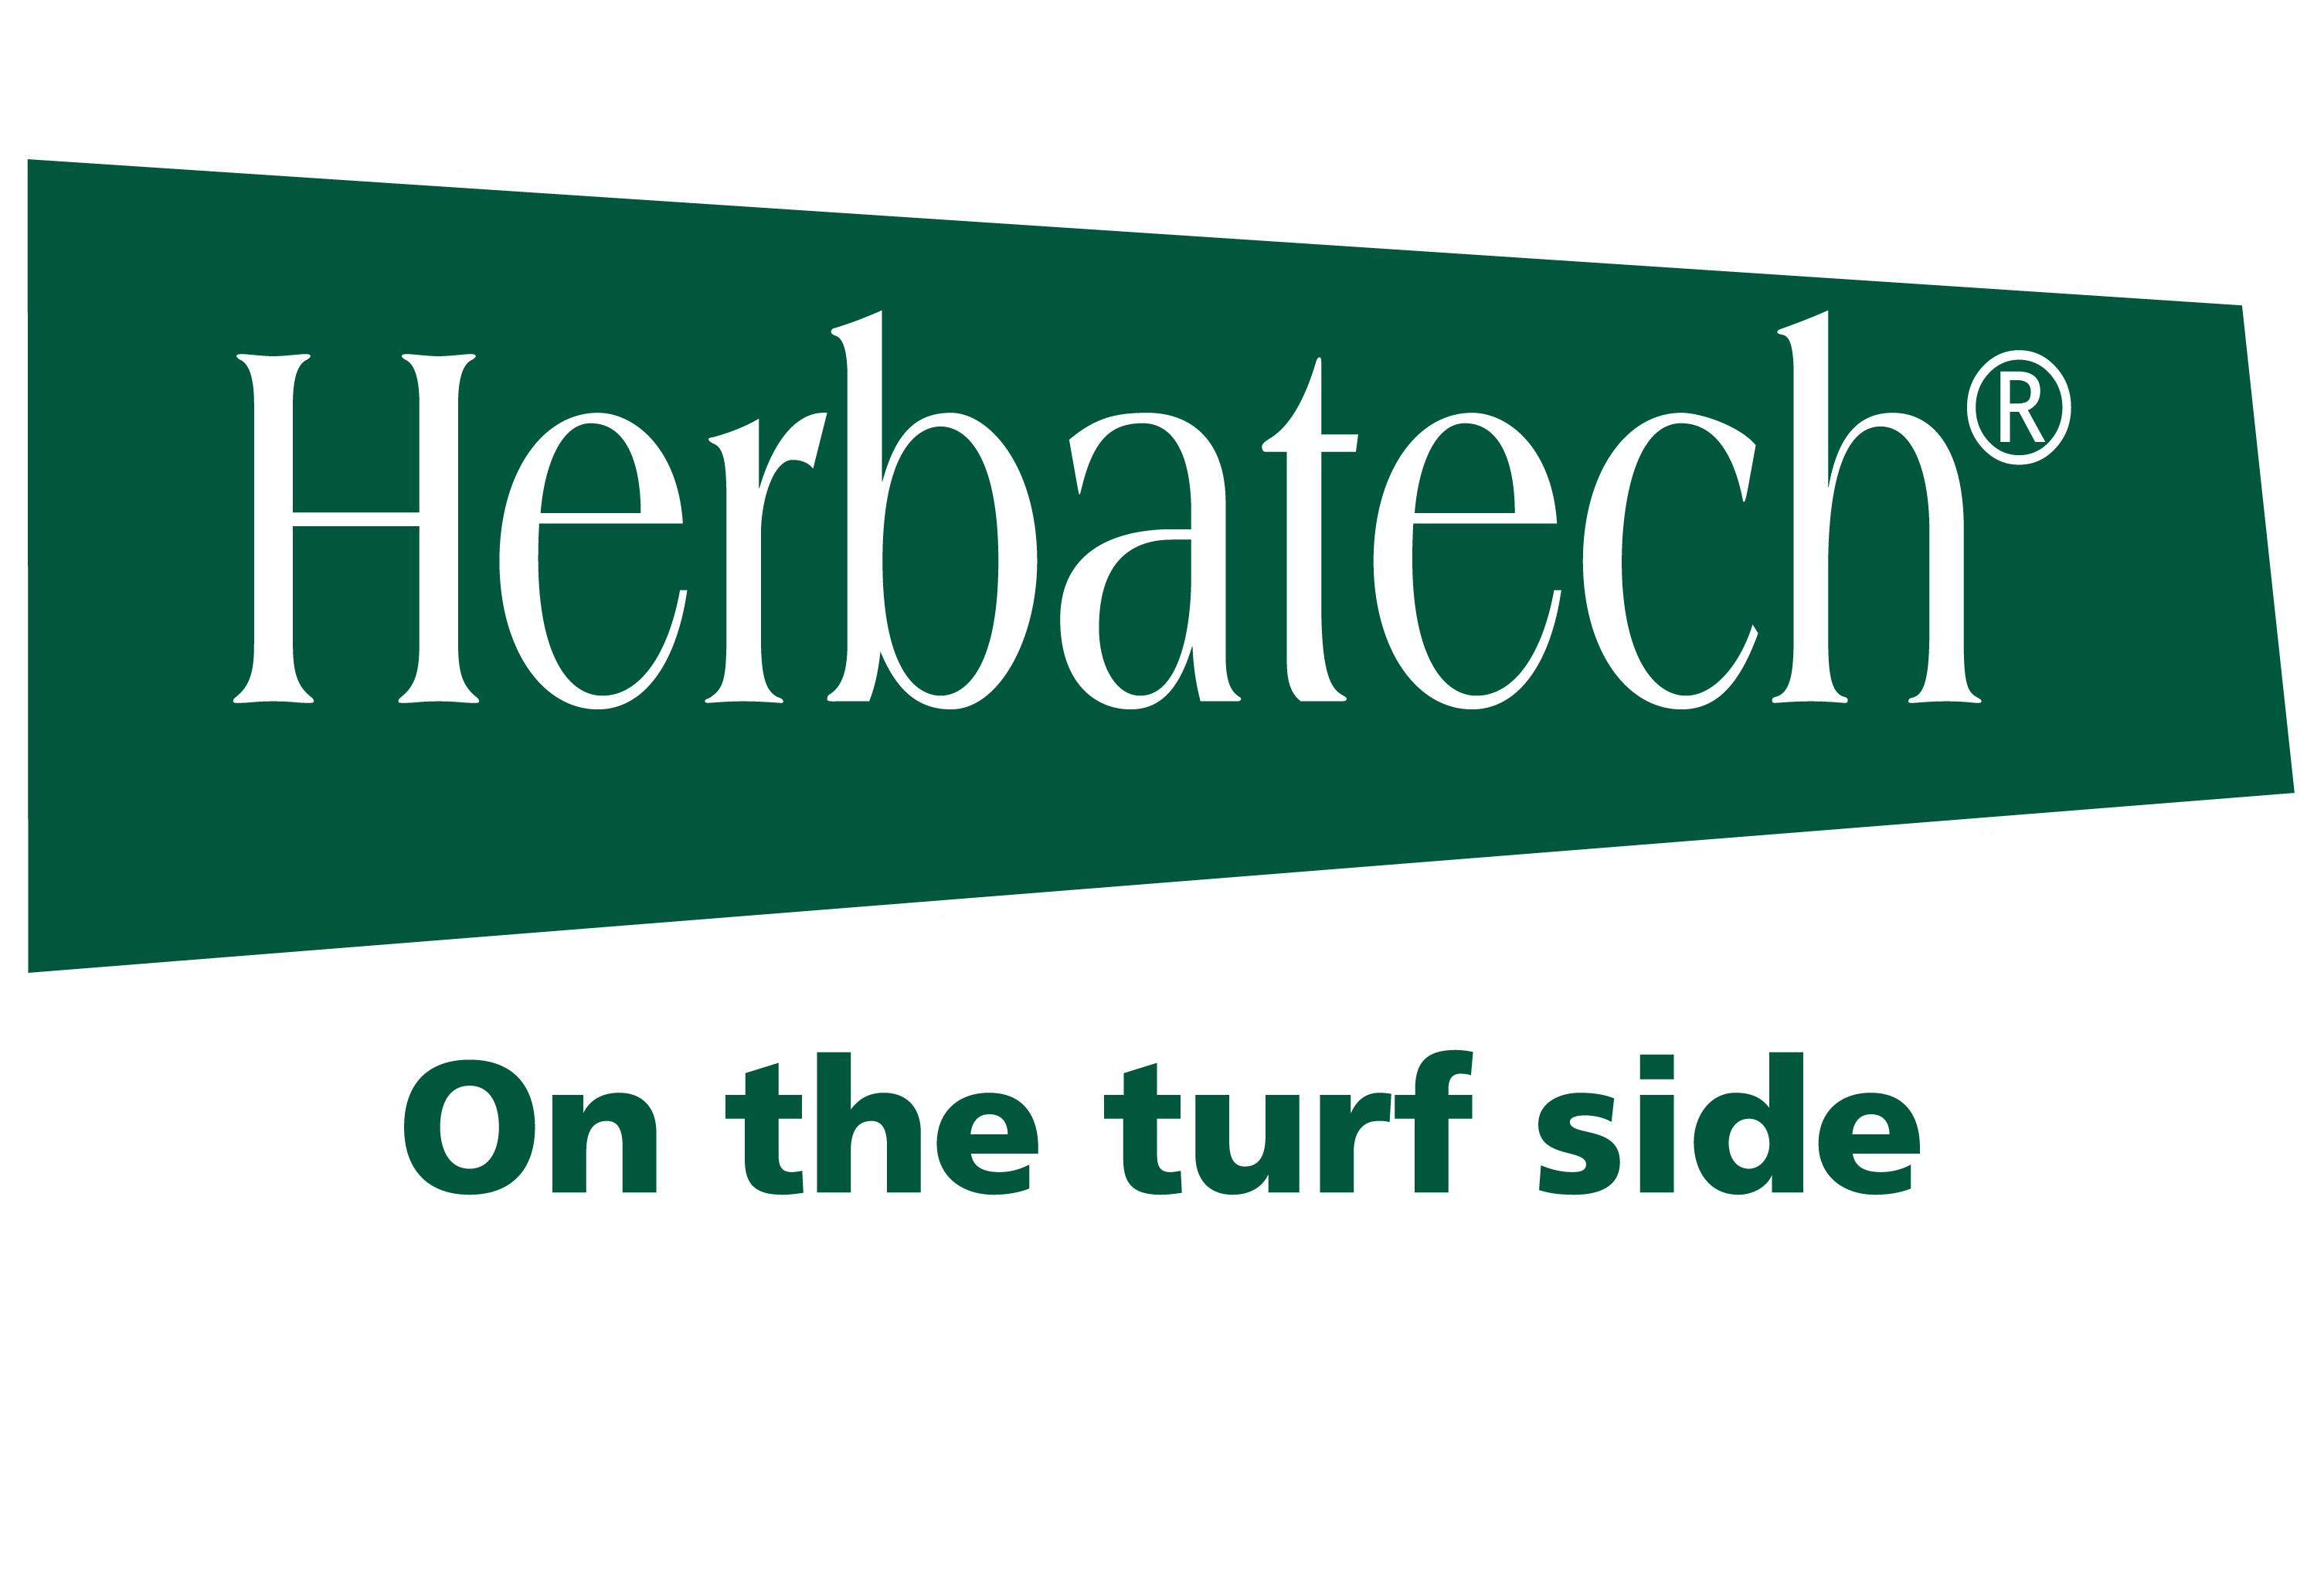 logo herbatech